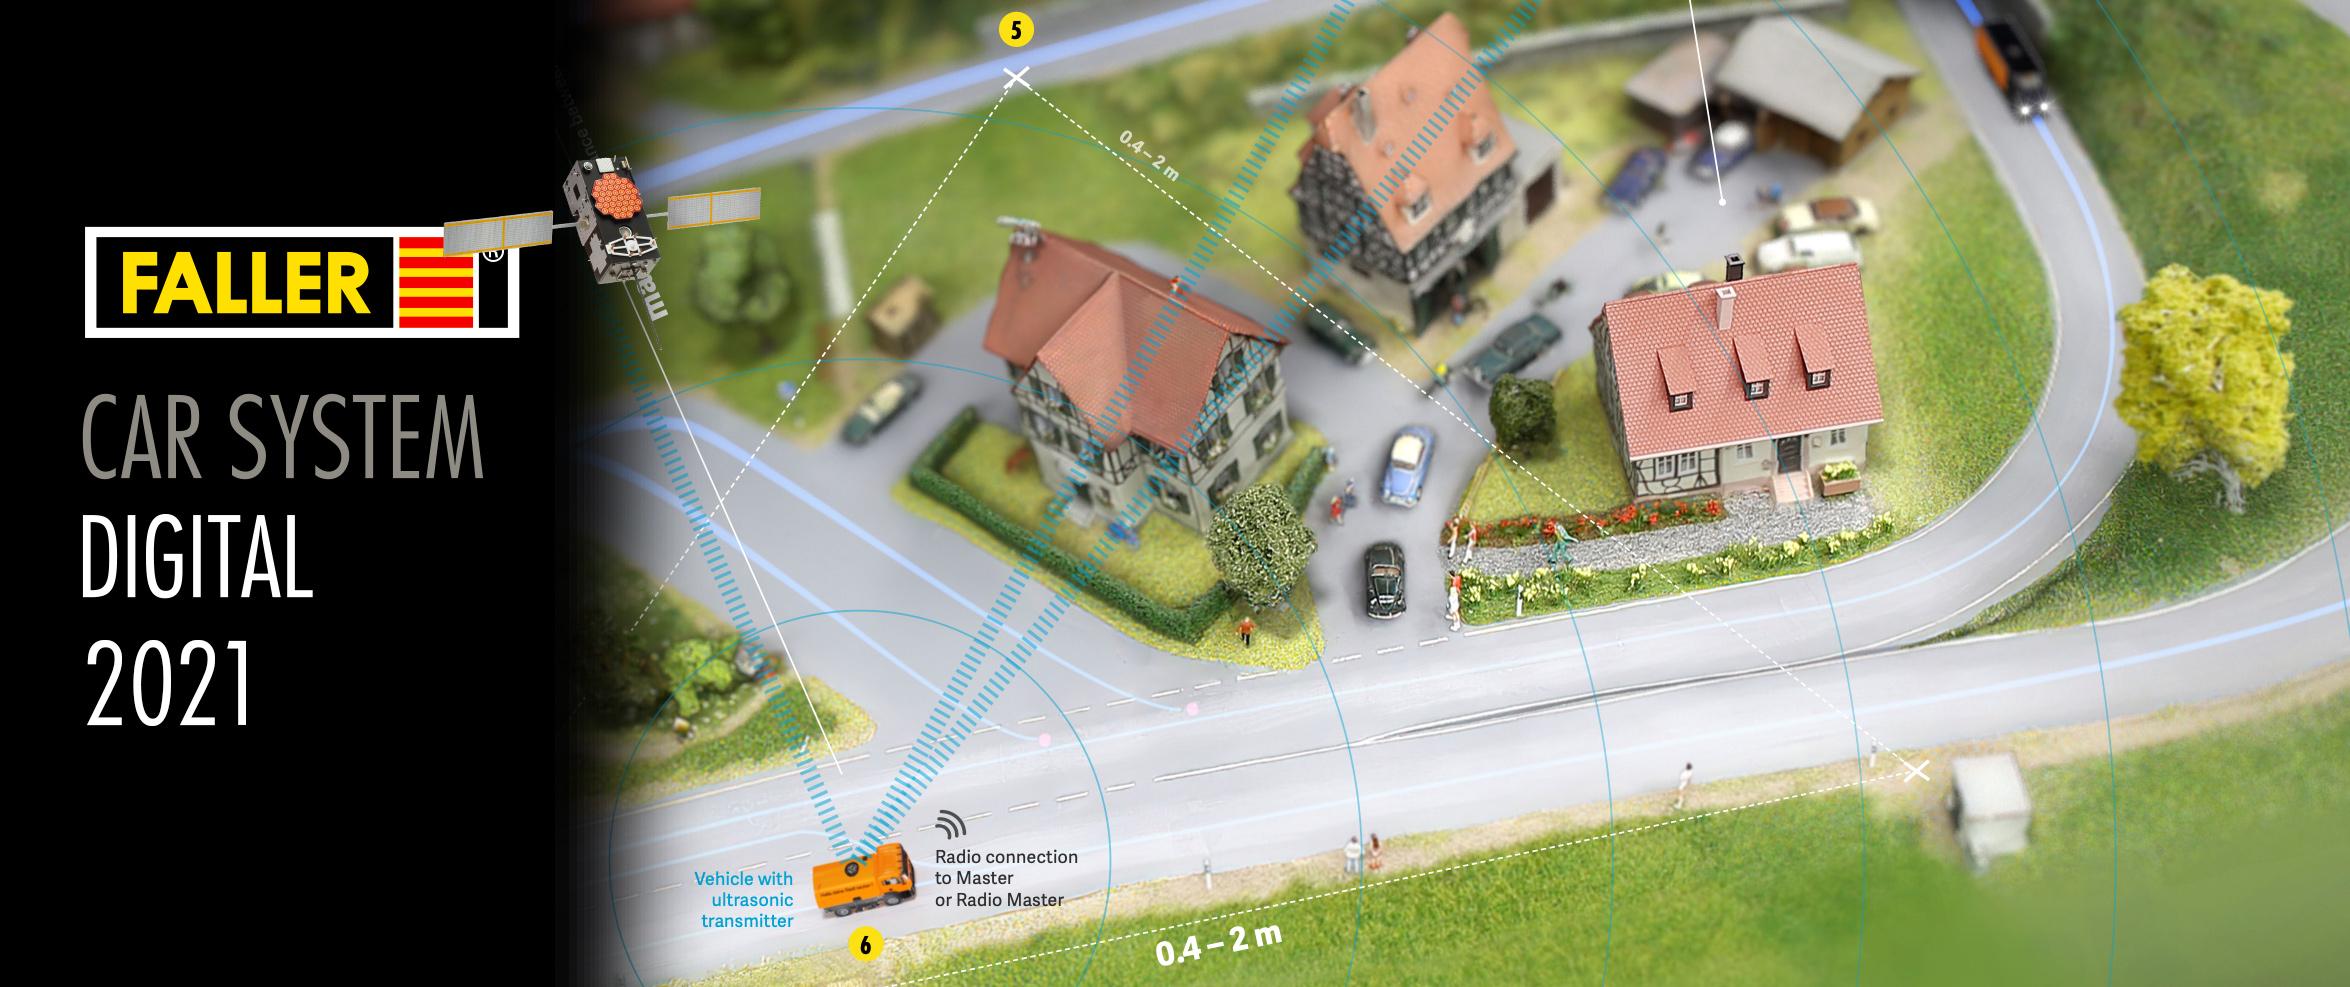 FALLER Car System Digital 2021 update